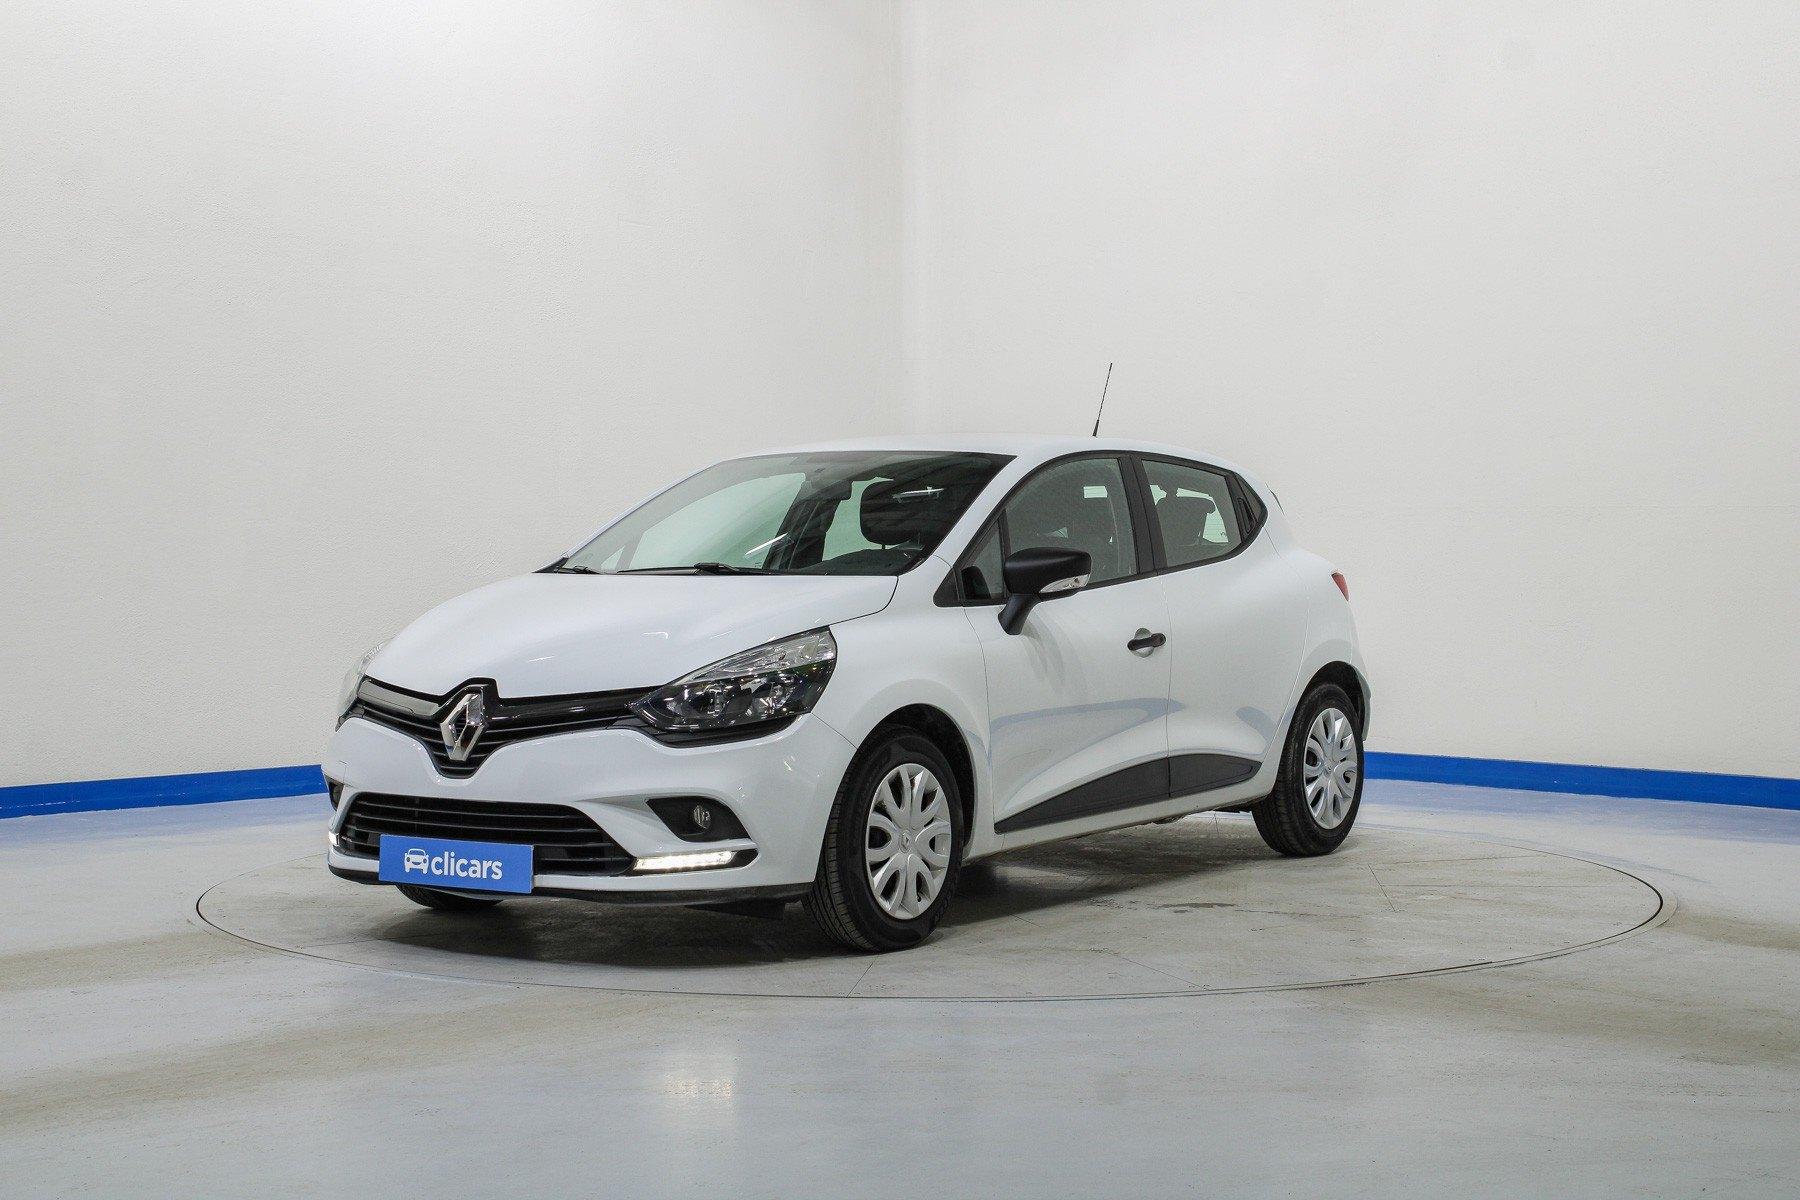 Renault Clio Diésel Business dCi 66kW (90CV) -18 1